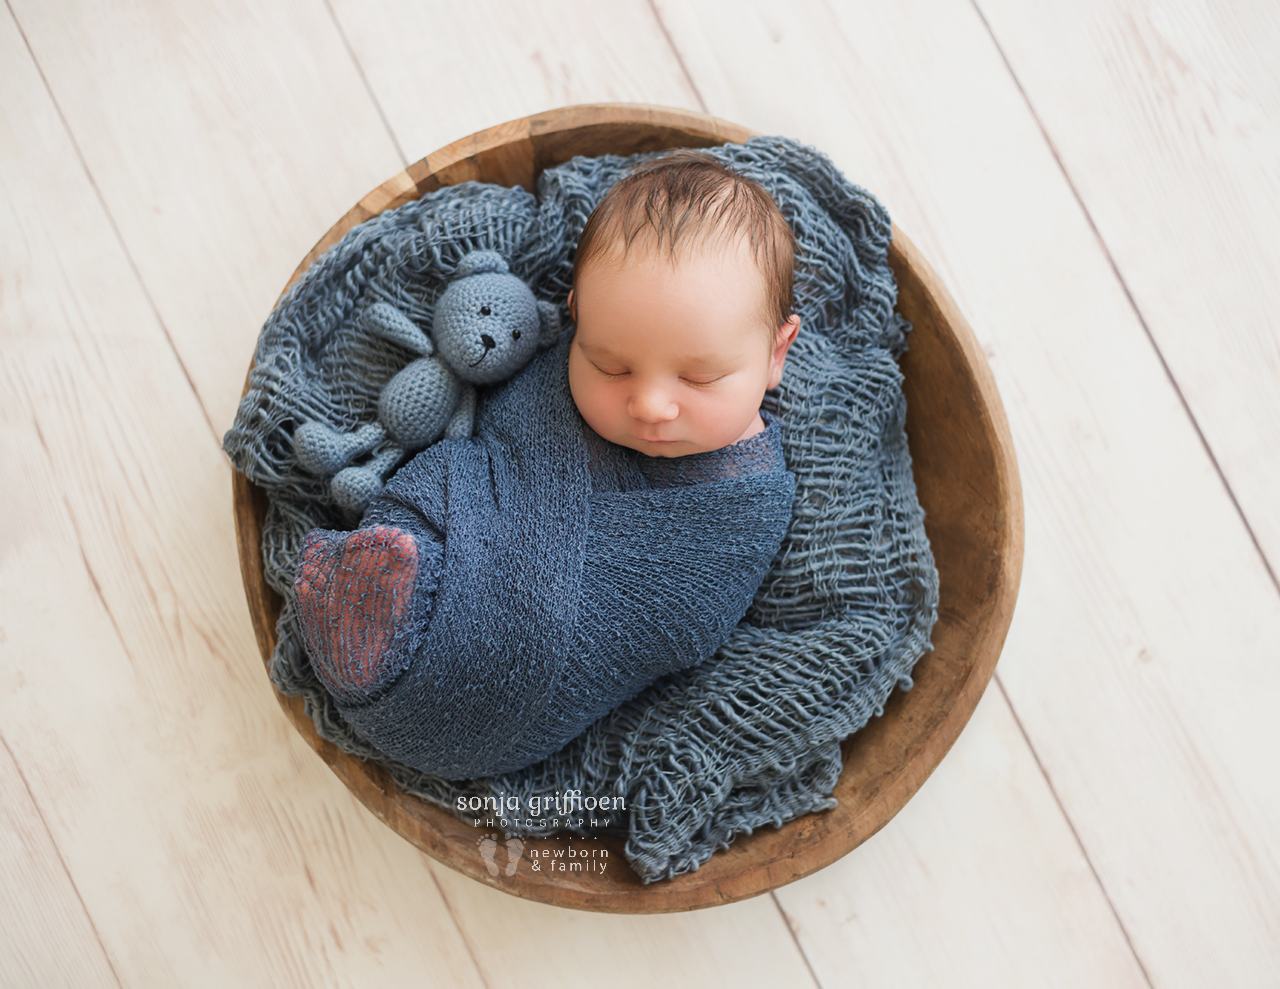 Oliver-Small-Newborn-Brisbane-Newborn-Photographer-Sonja-Griffioen-10.jpg